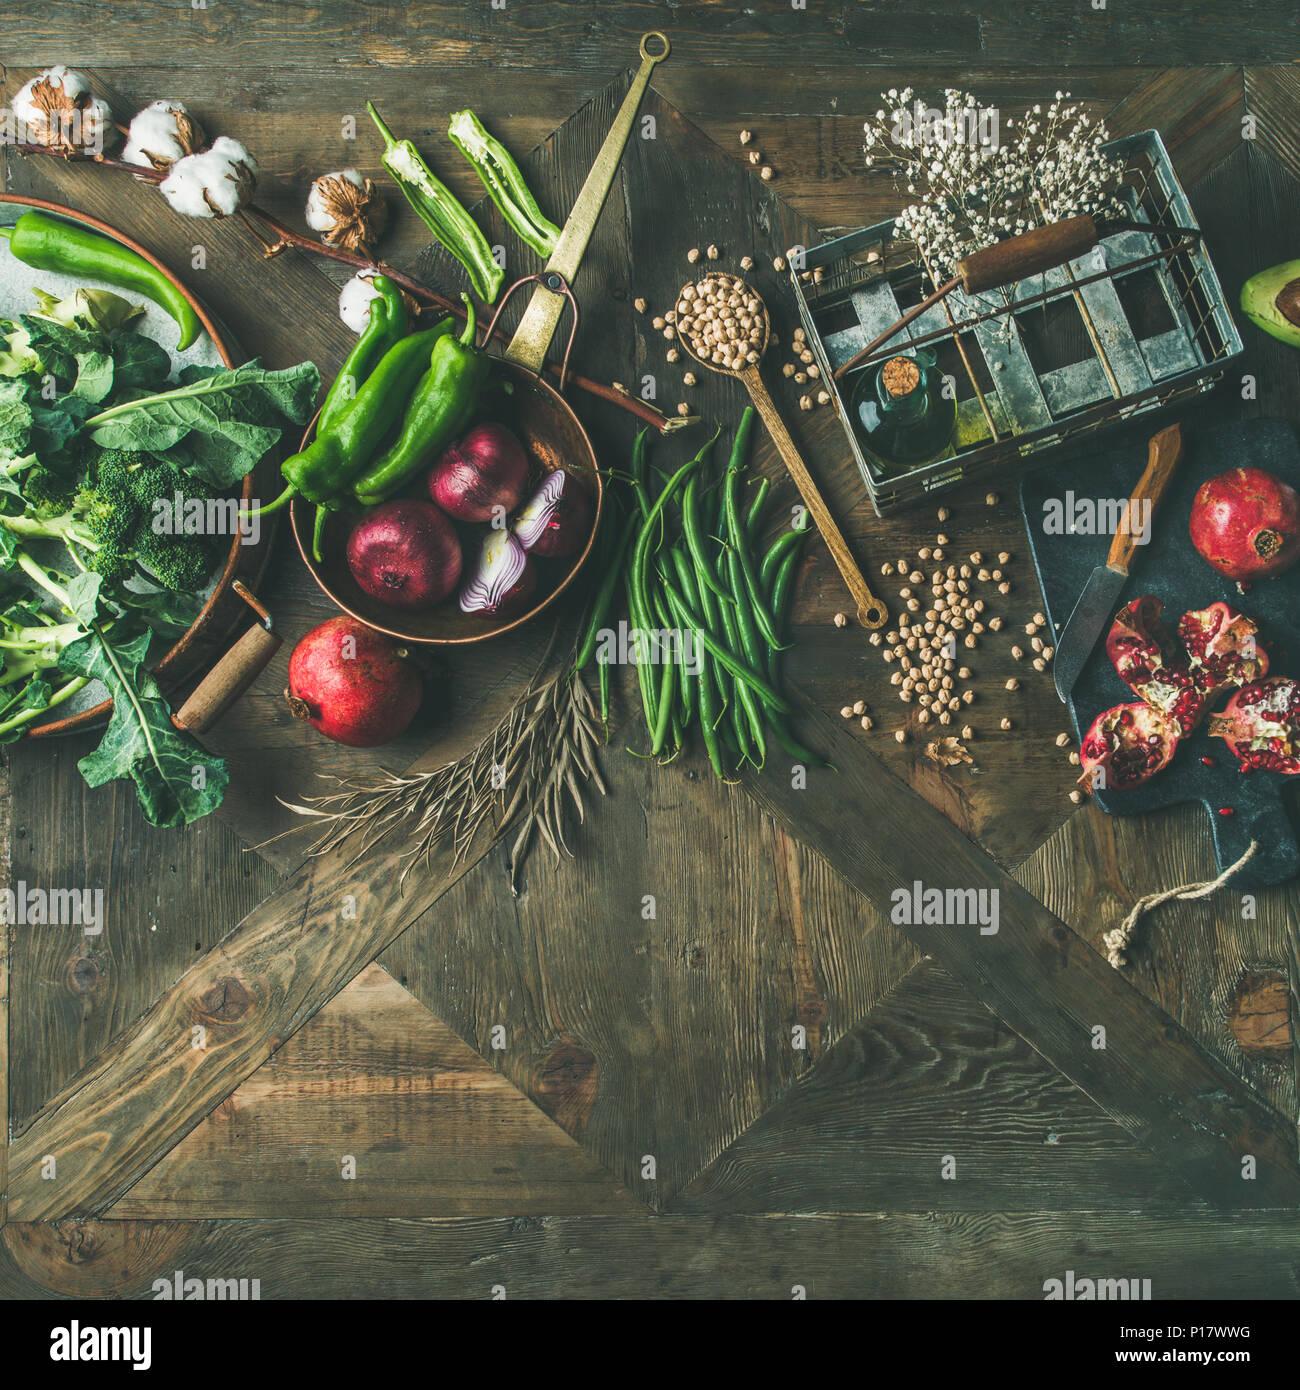 Winter vegetarian or vegan food cooking ingredients - Stock Image